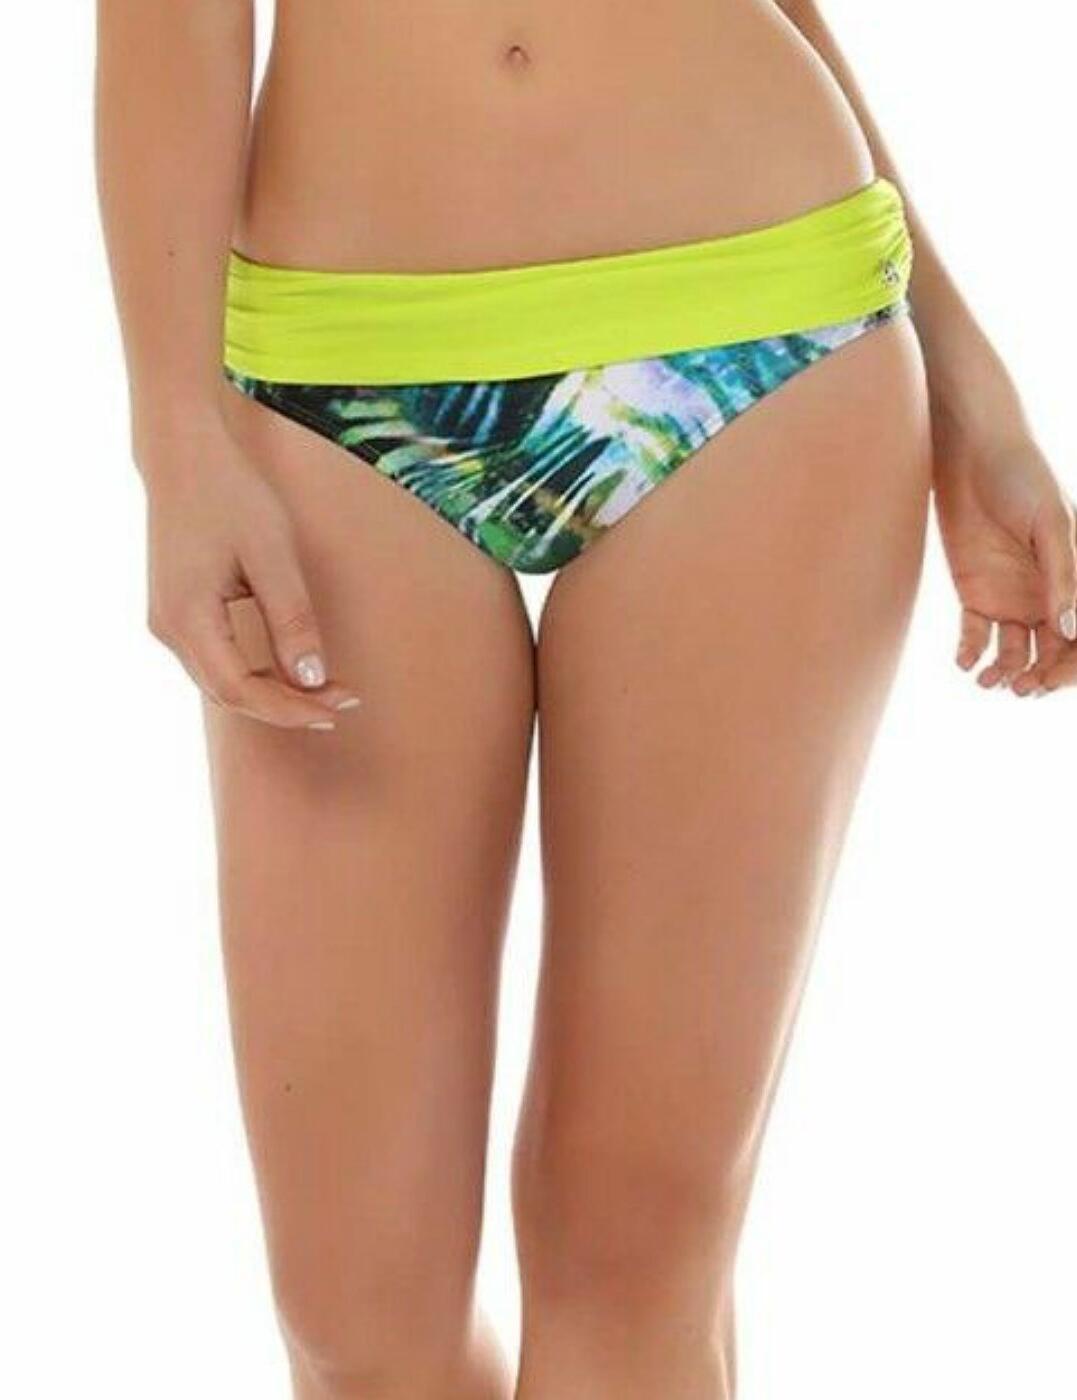 13-1350 Seaspray Monteverde Fold Waist Bikini Brief - 13-1350 Green/Blue